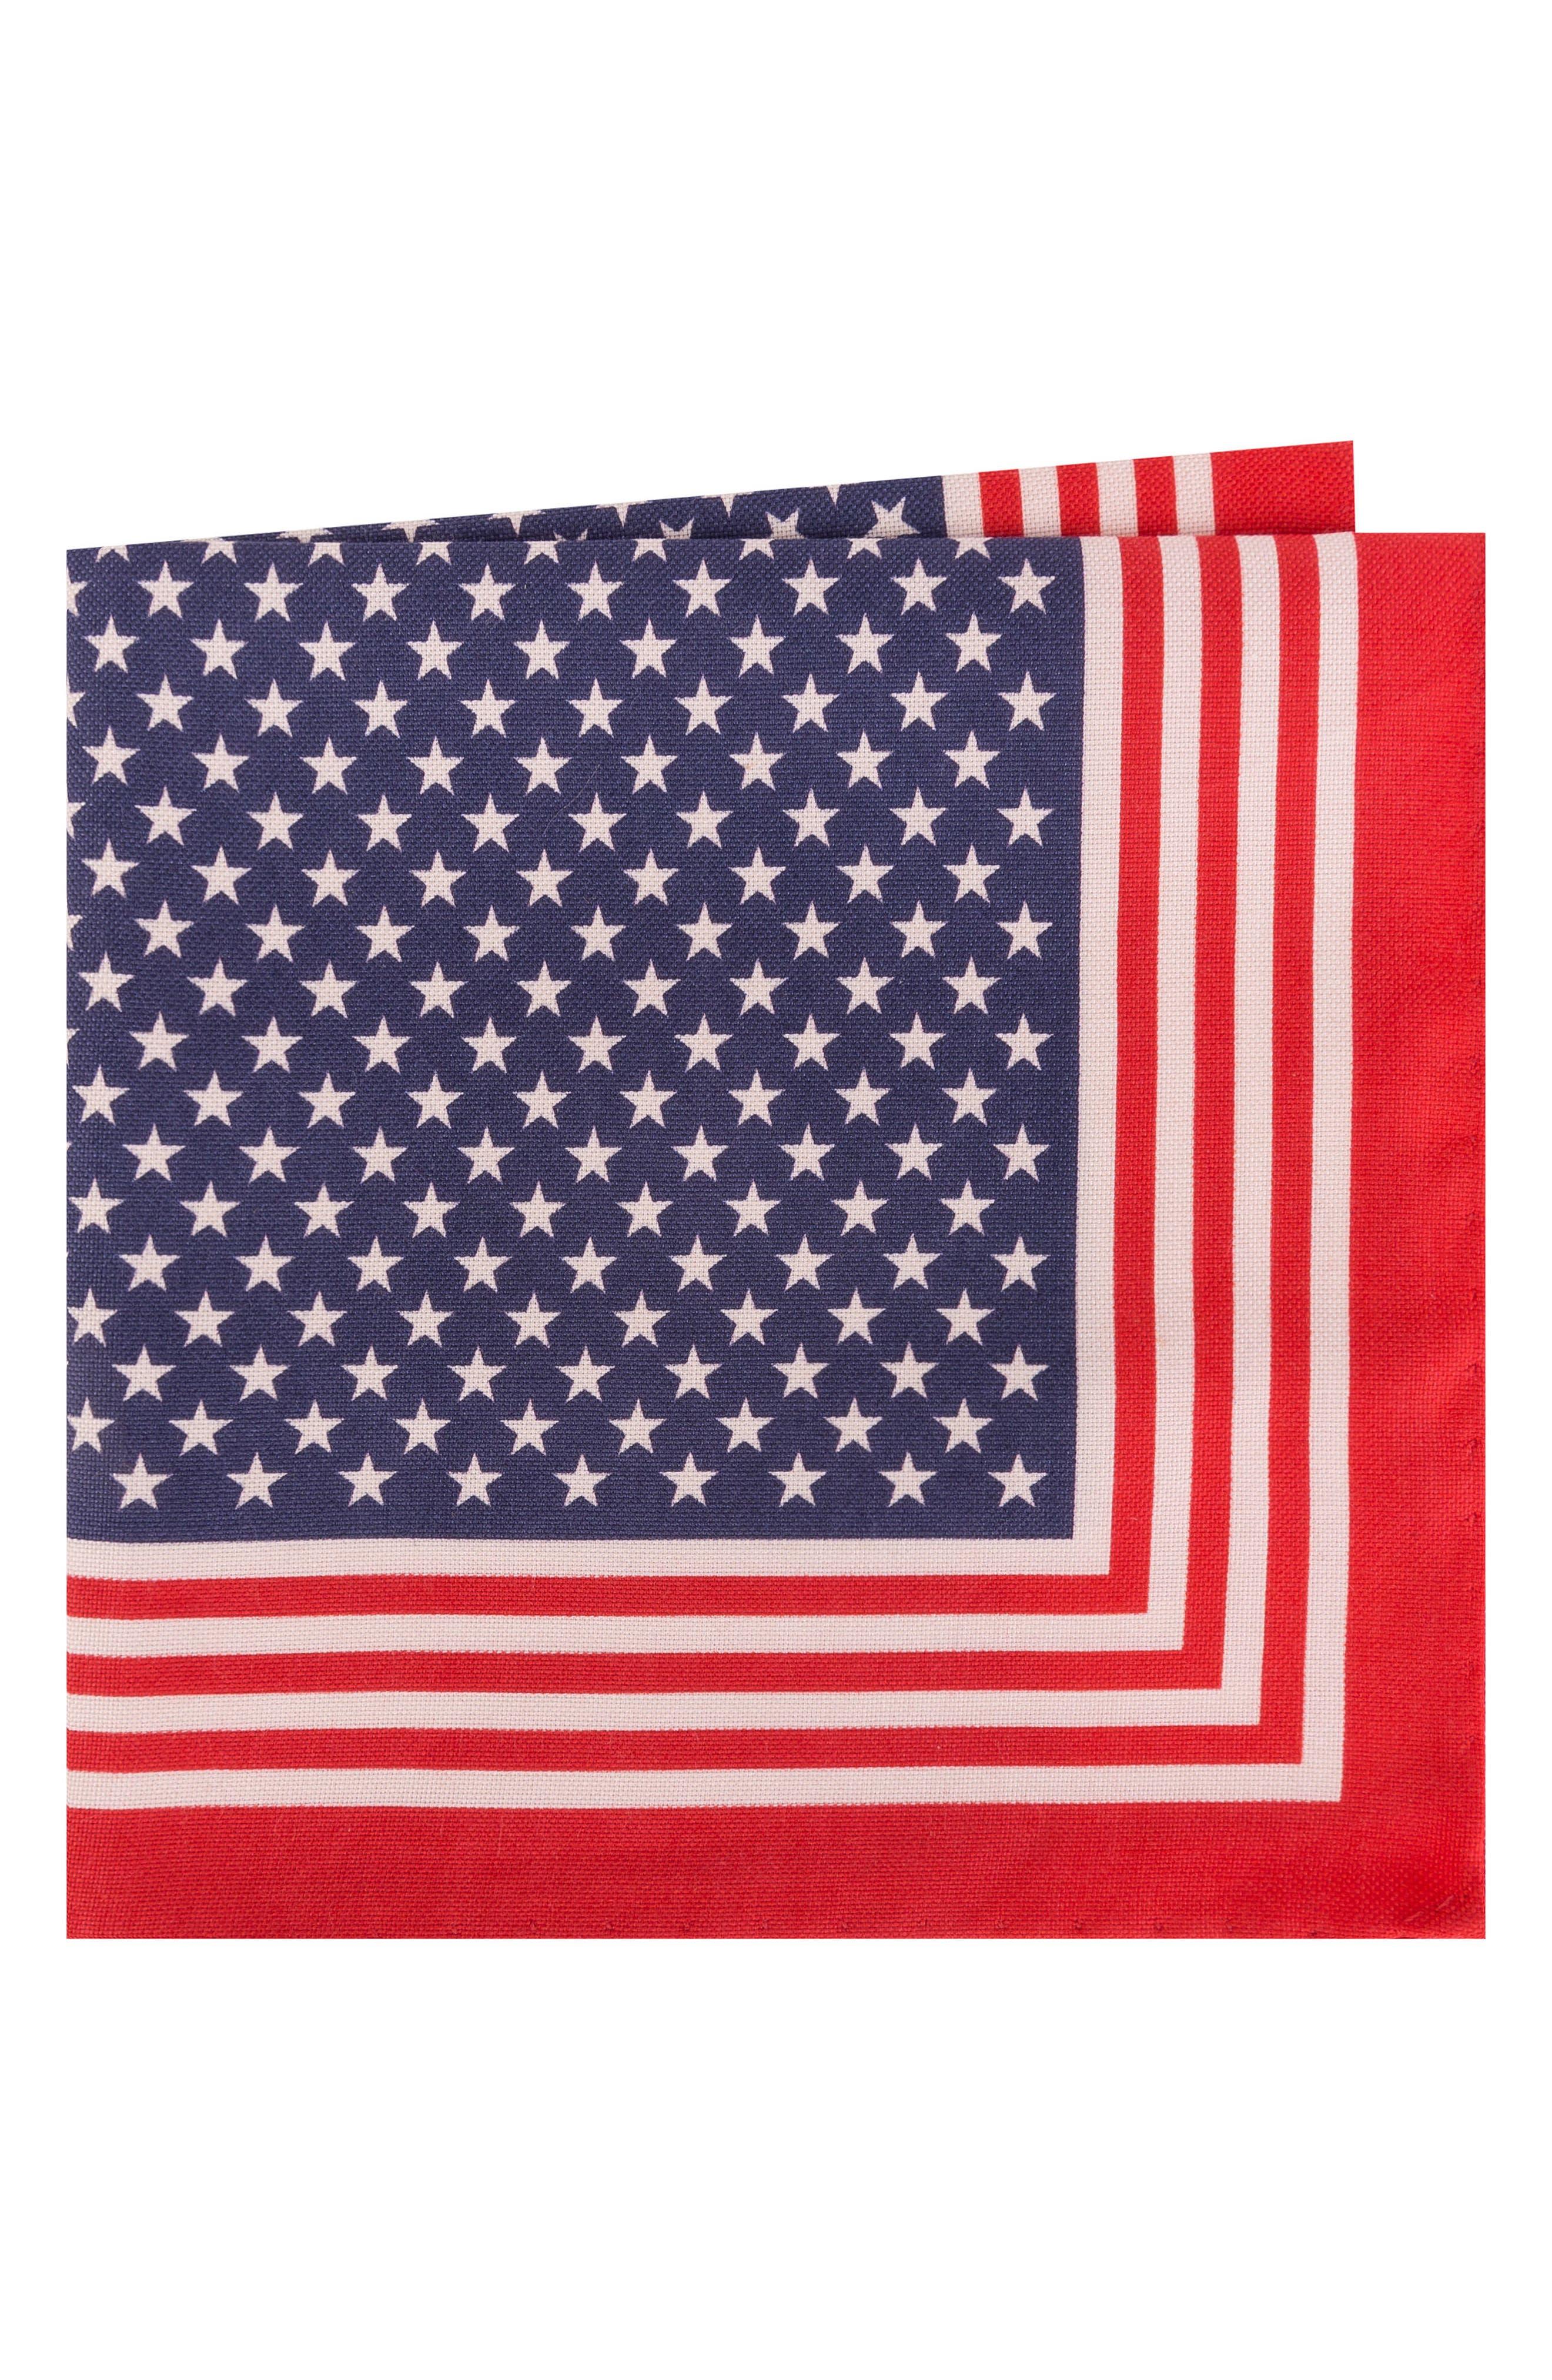 Alternate Image 1 Selected - Ted Baker London Stars & Stripes Cotton & Silk Pocket Square